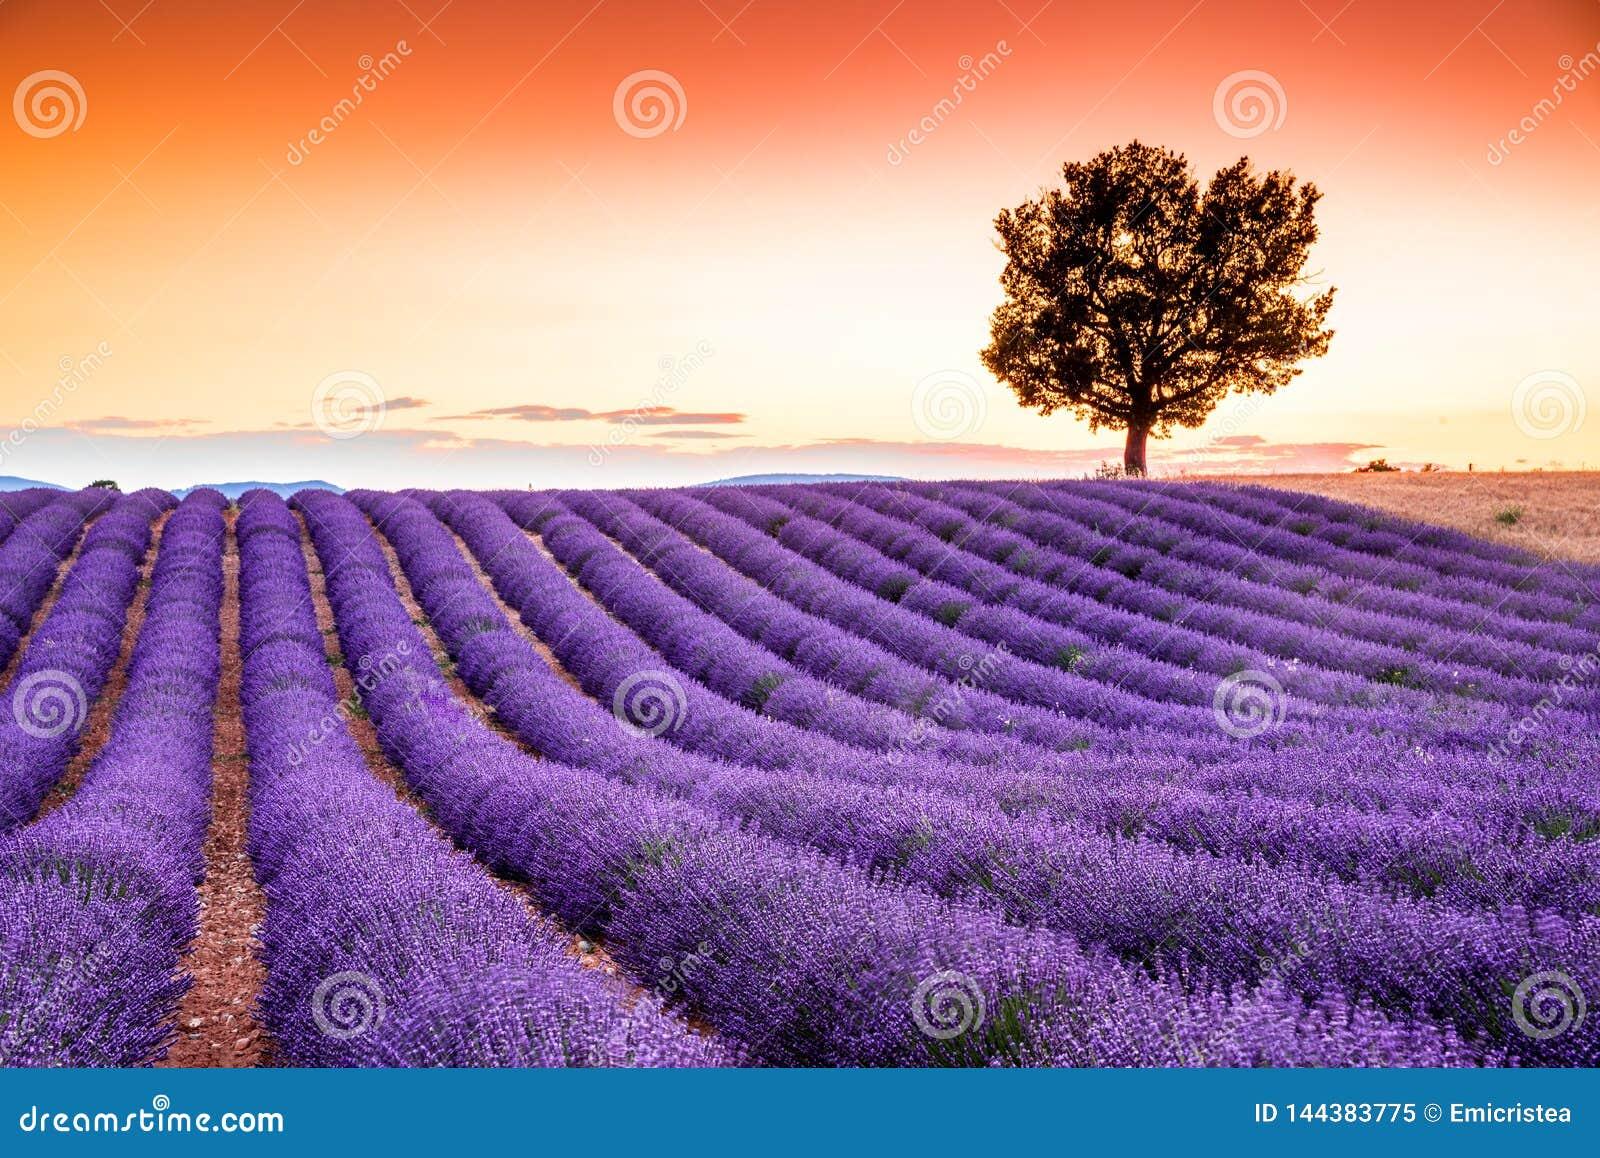 Valensole-Lavendel in Provence, Frankreich